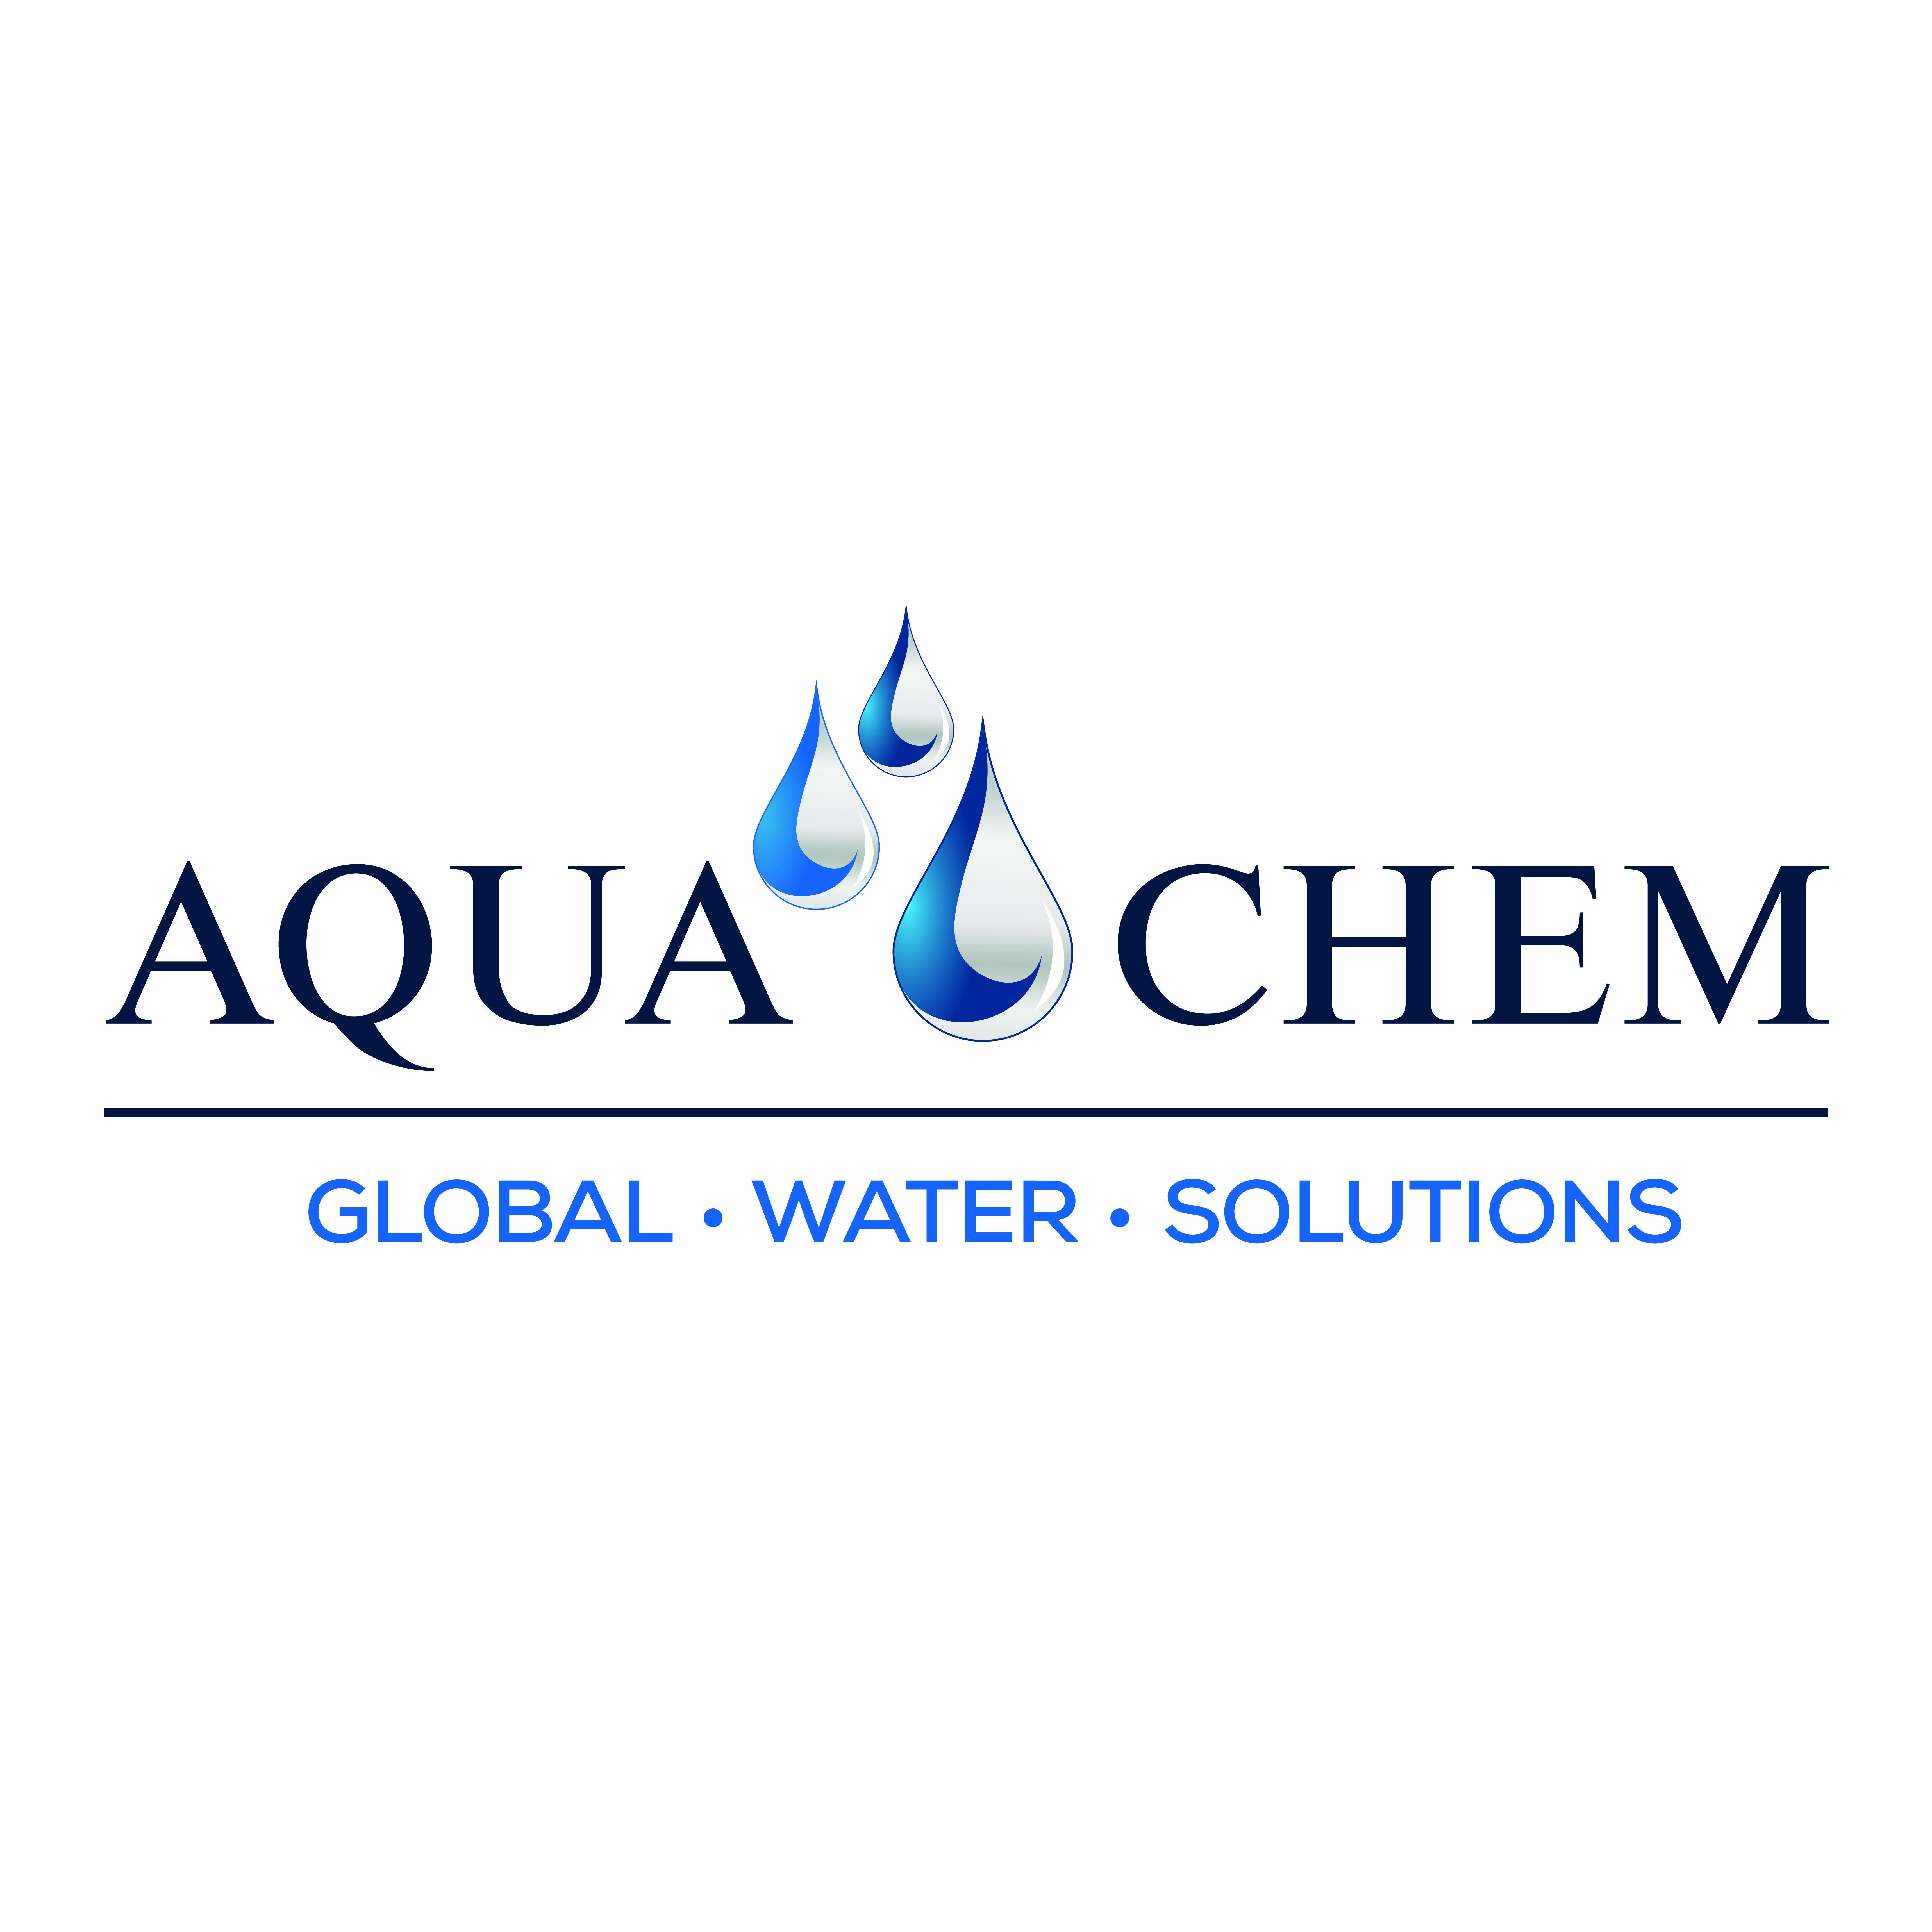 Aqua-Chem - sponsoring BevNET Live Summer 2019